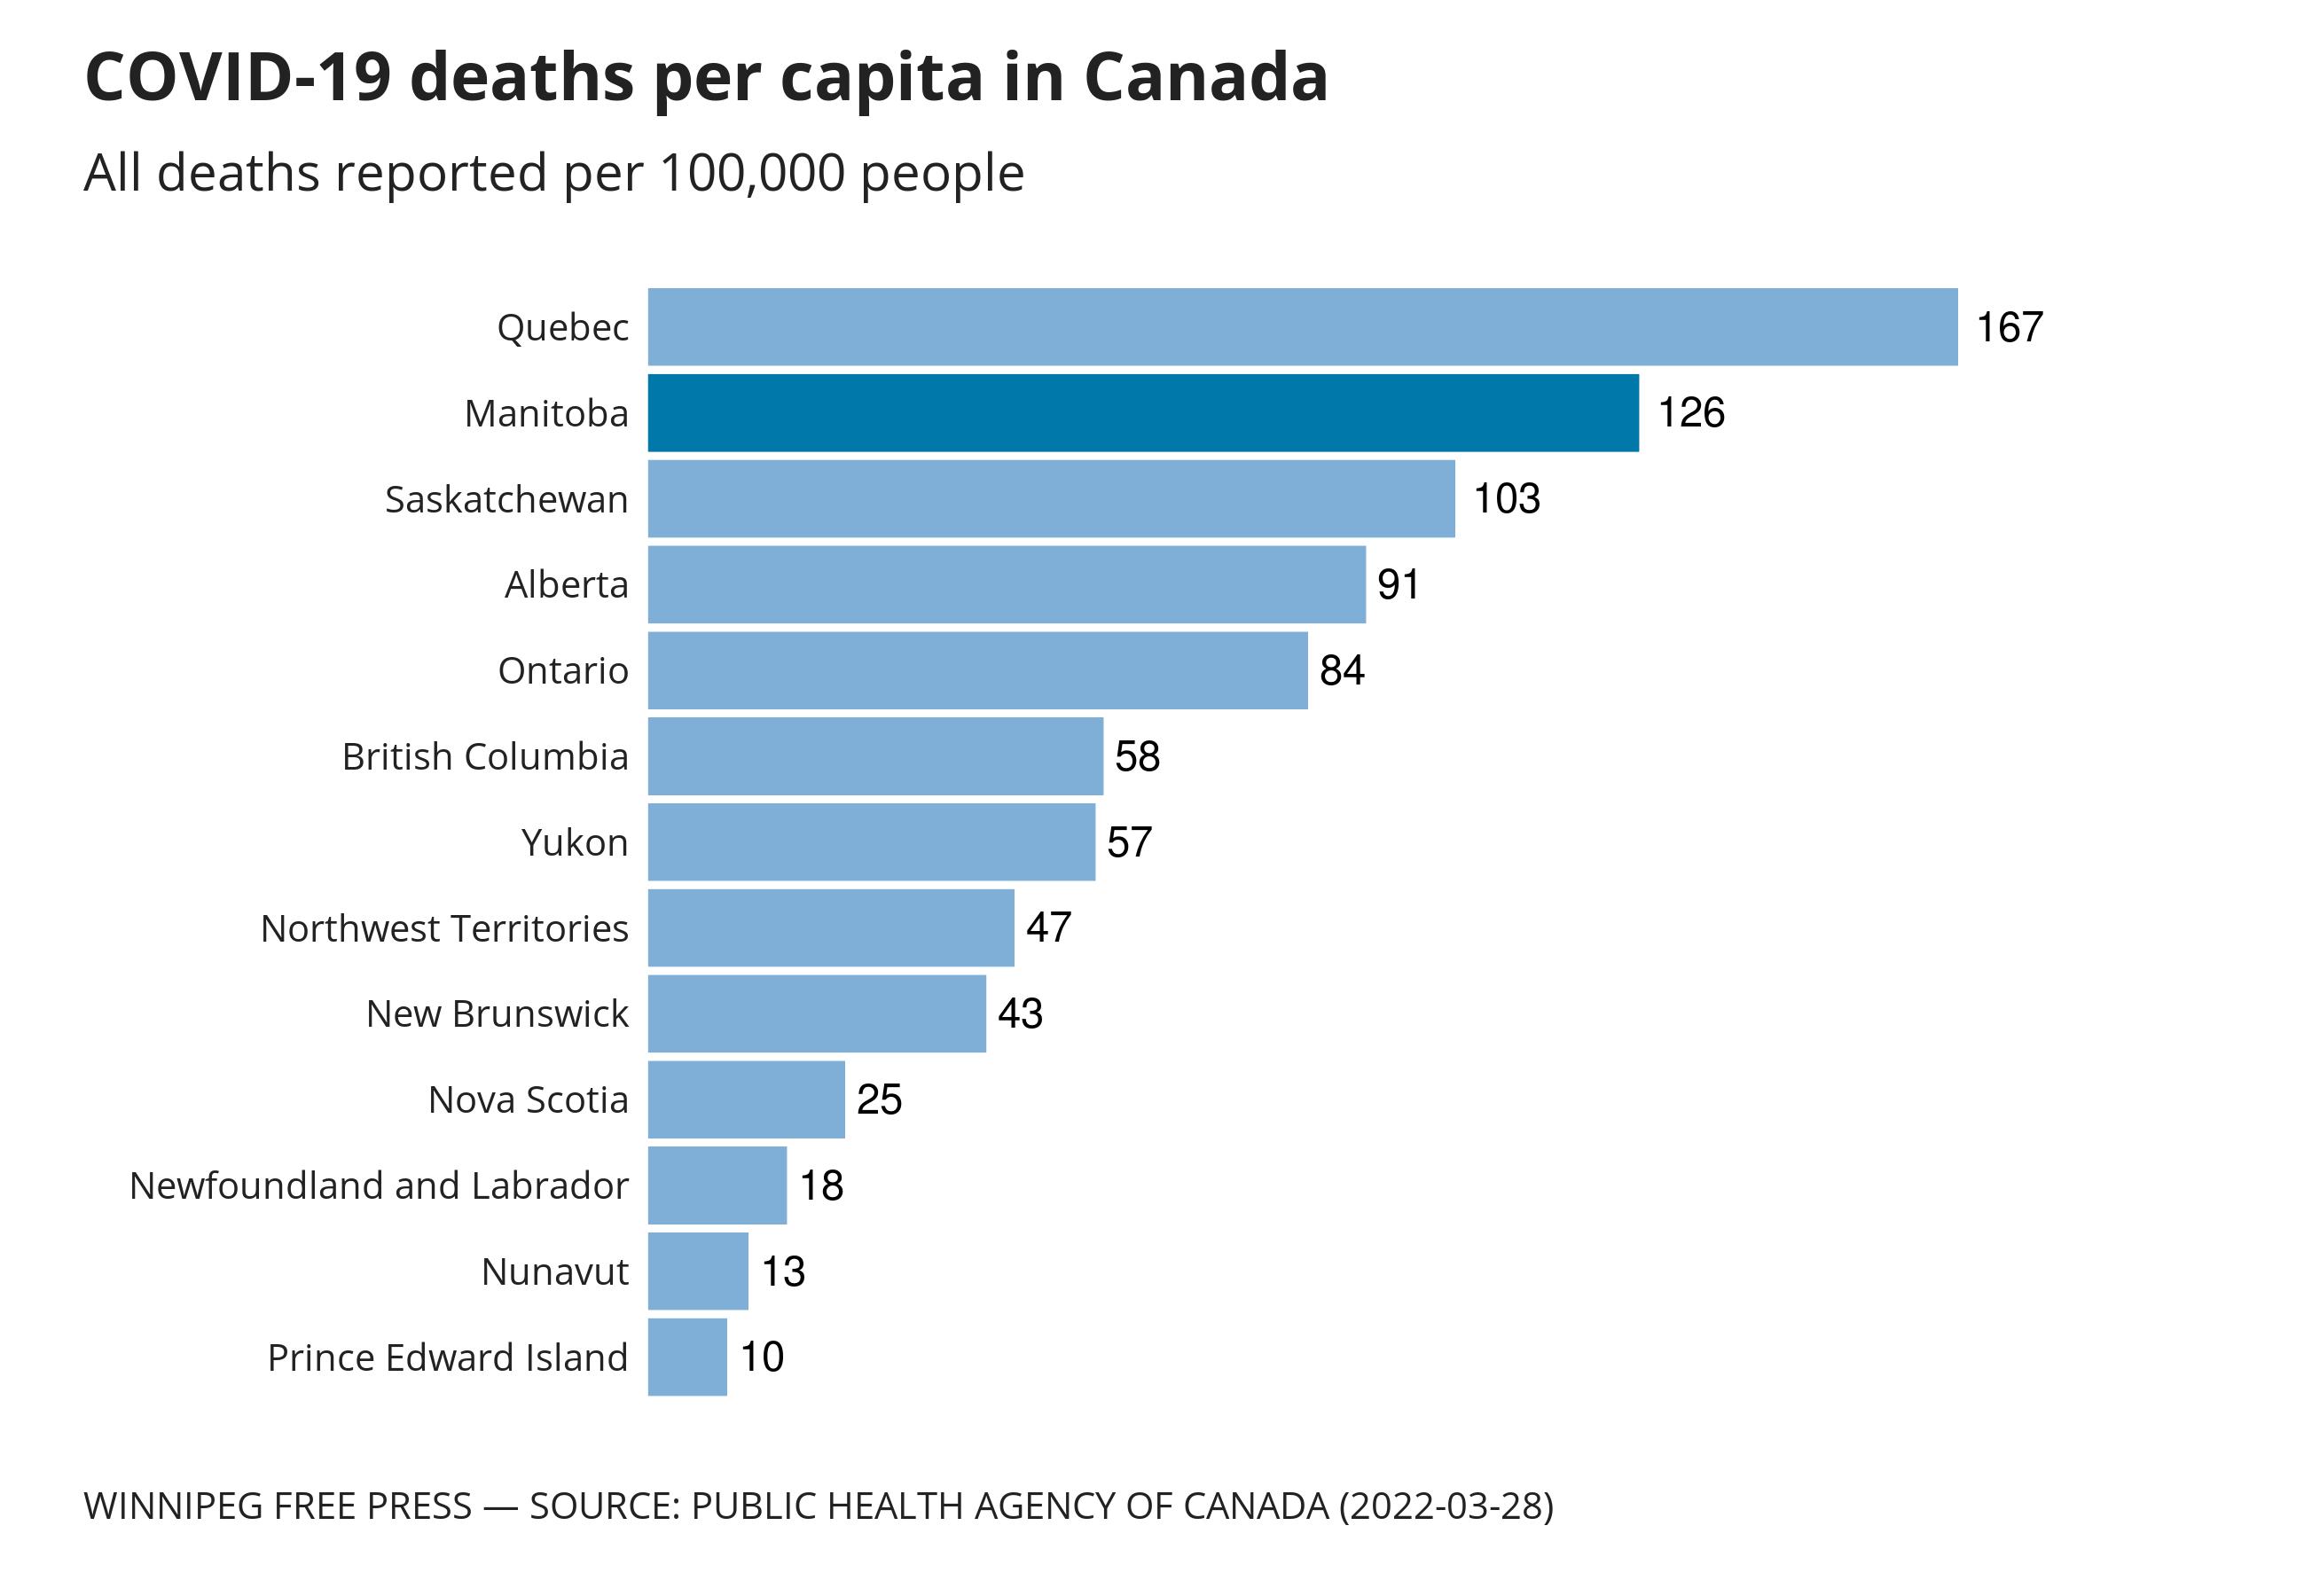 Comparison of COVID-19 deaths per capita across the provinces